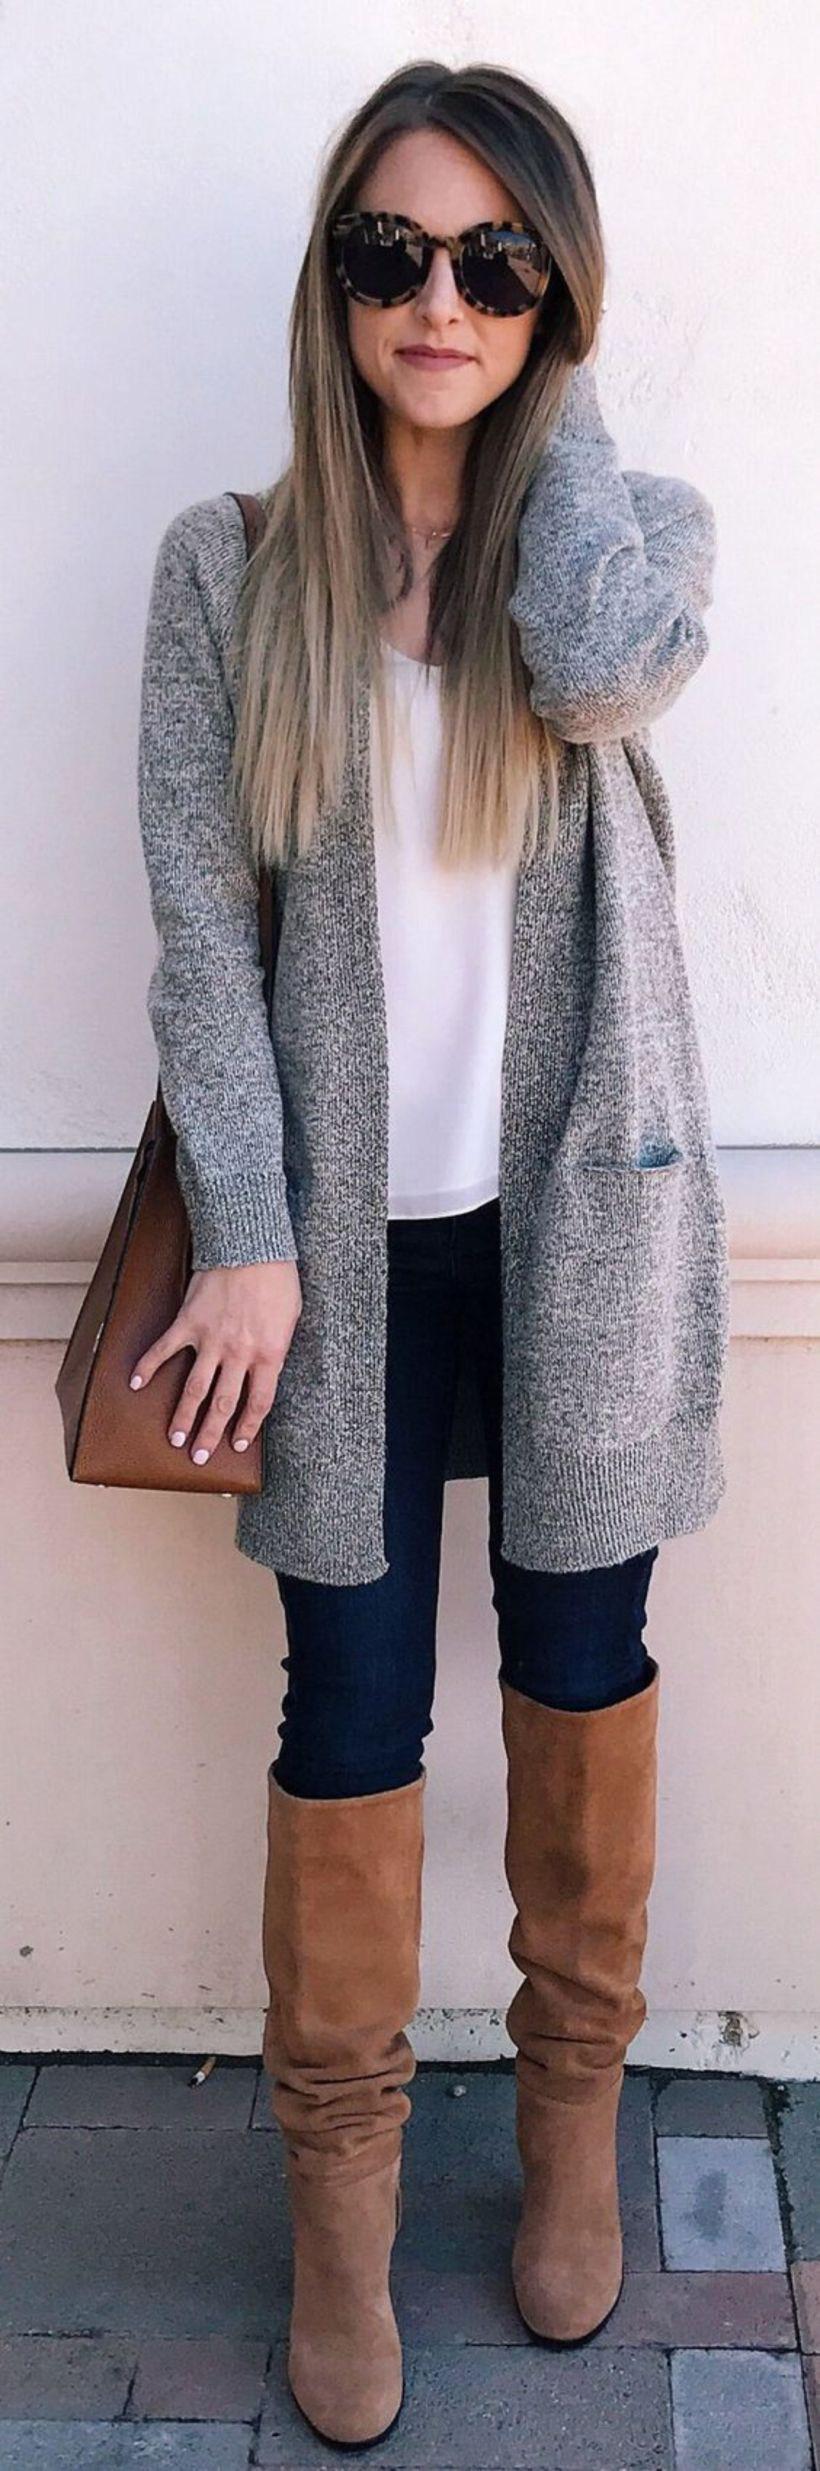 tenue hiver femme